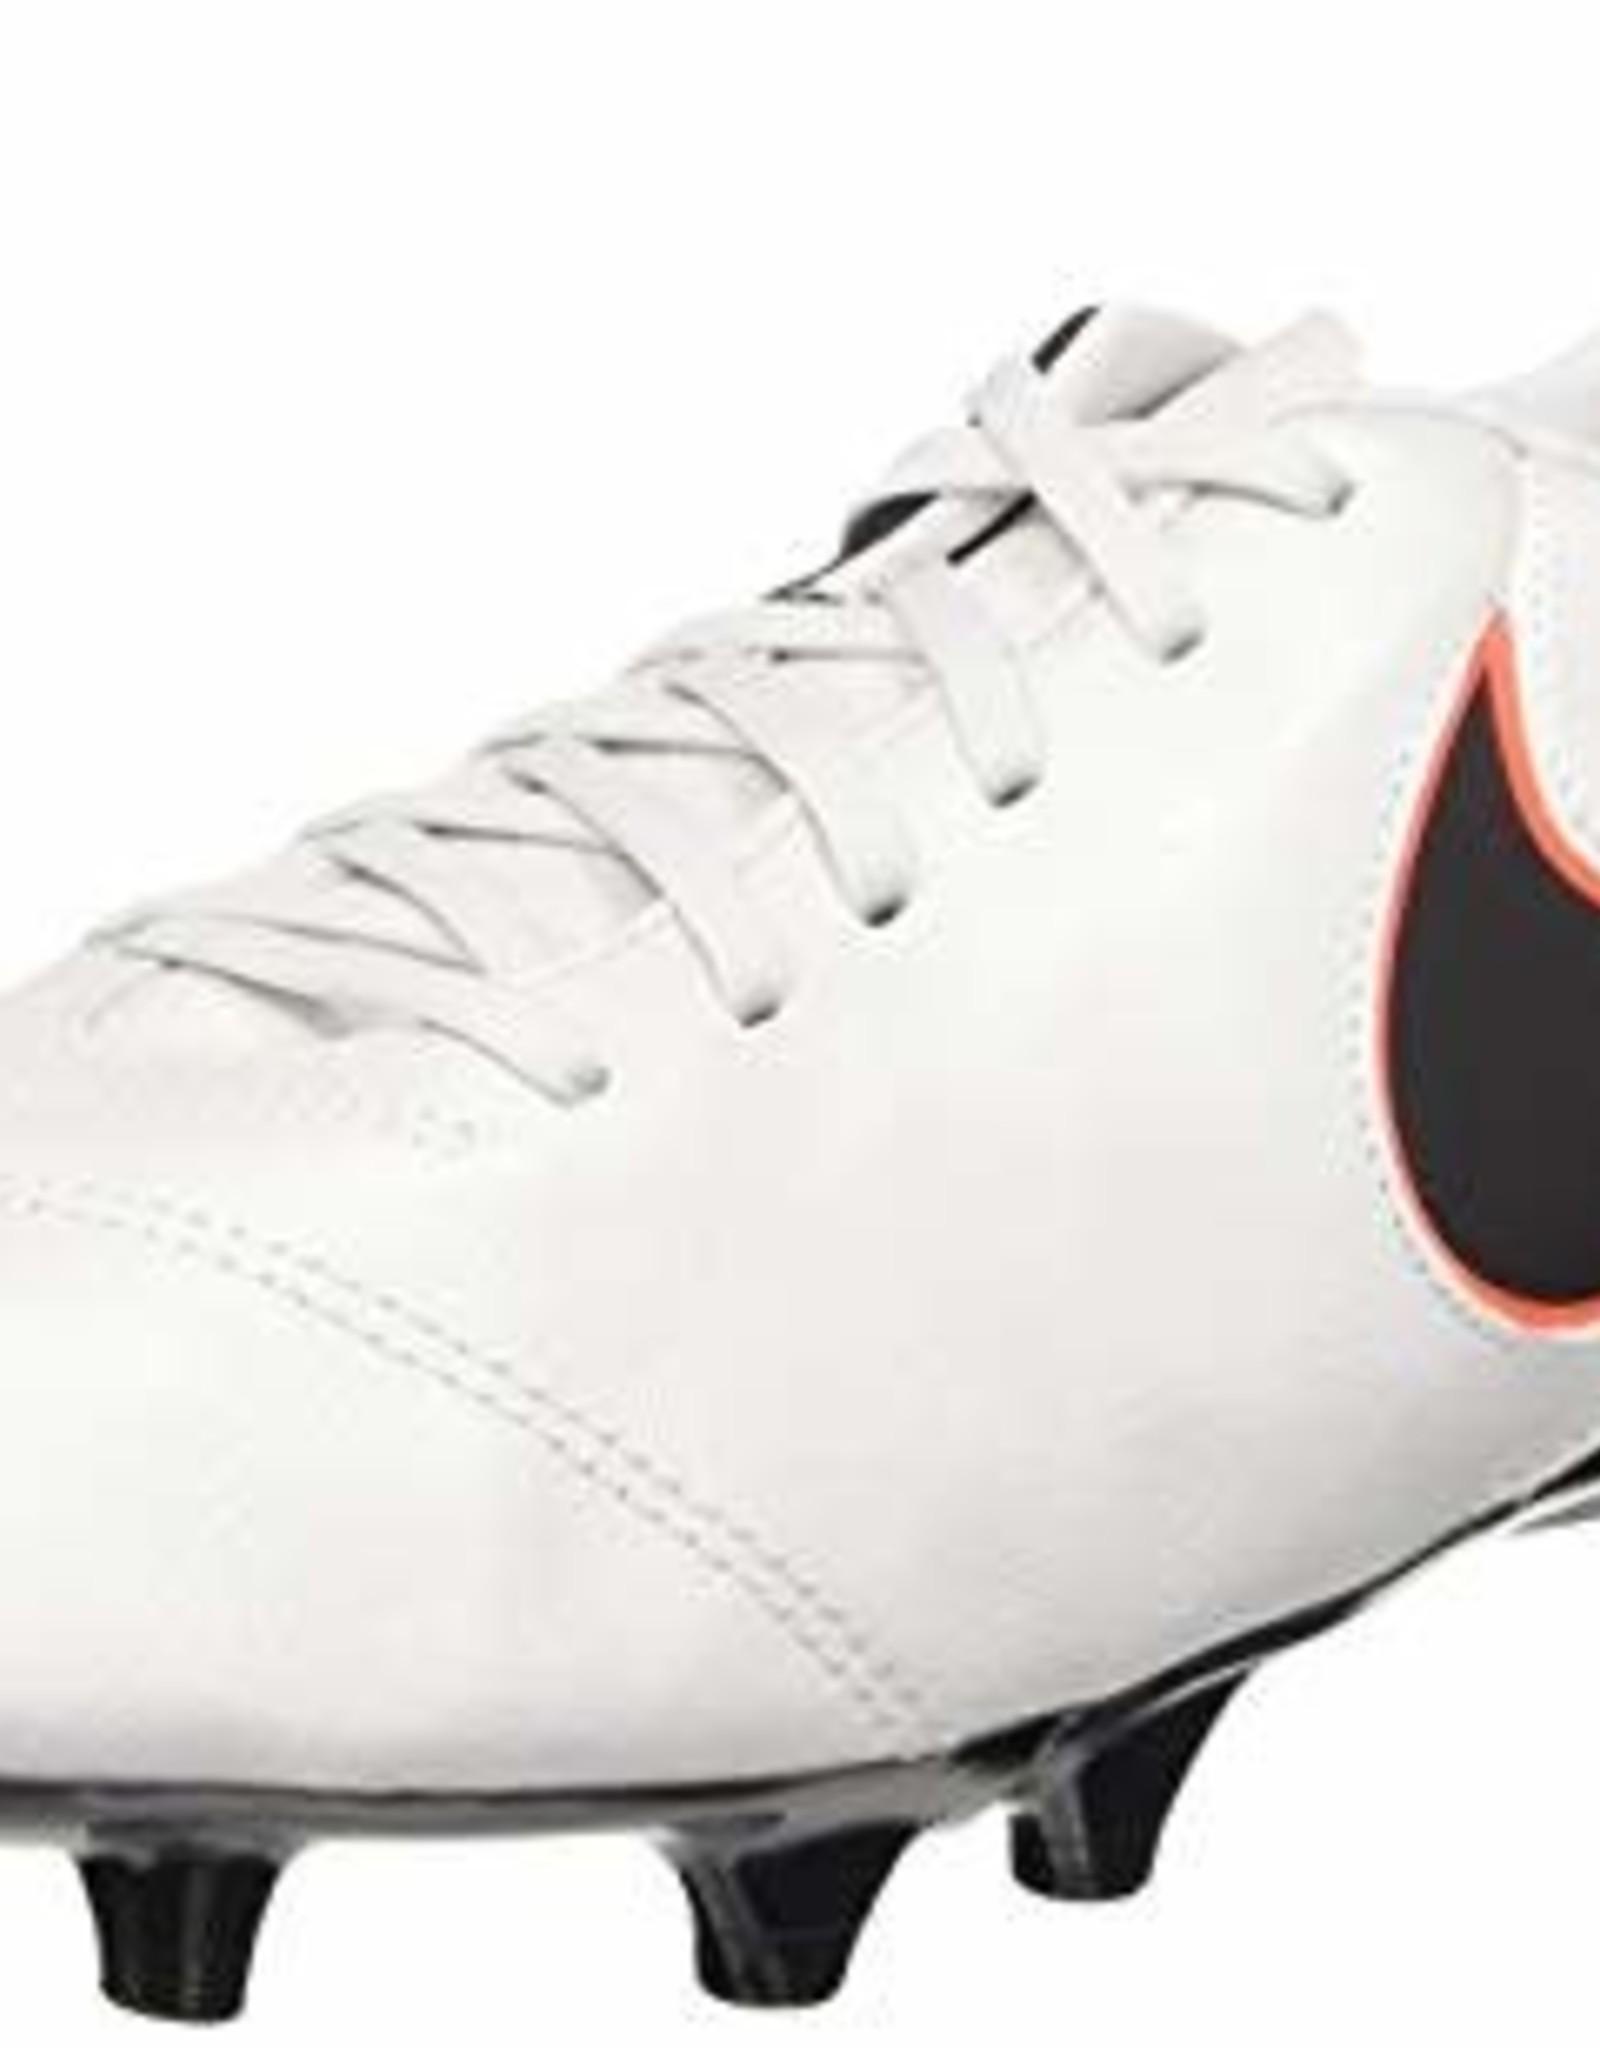 Nike NIke Tempo Mystic V FG